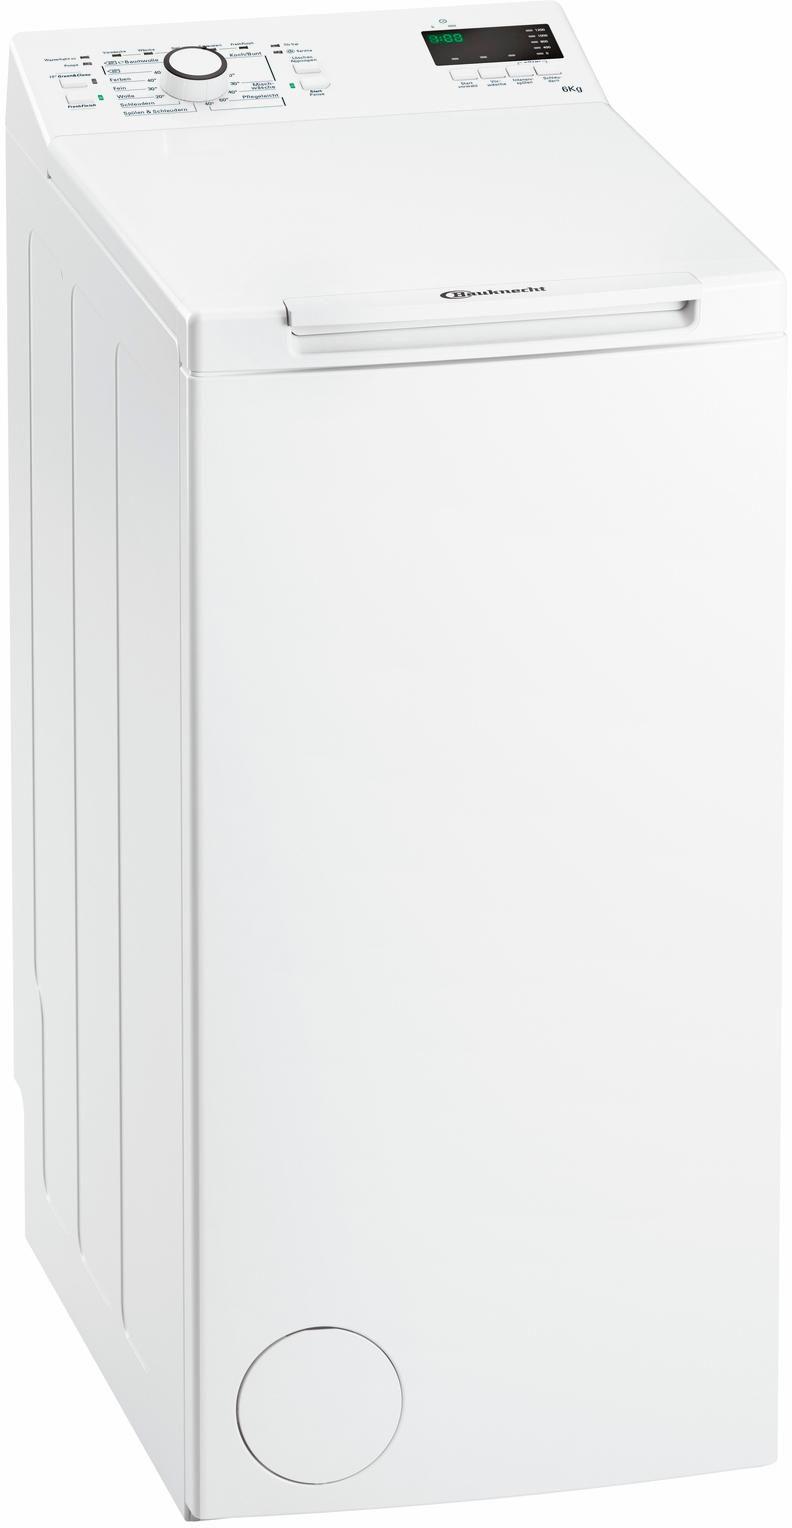 BAUKNECHT Waschmaschine Toplader WAT Prime 652 Di, A++, 6 kg, 1200 U/Min